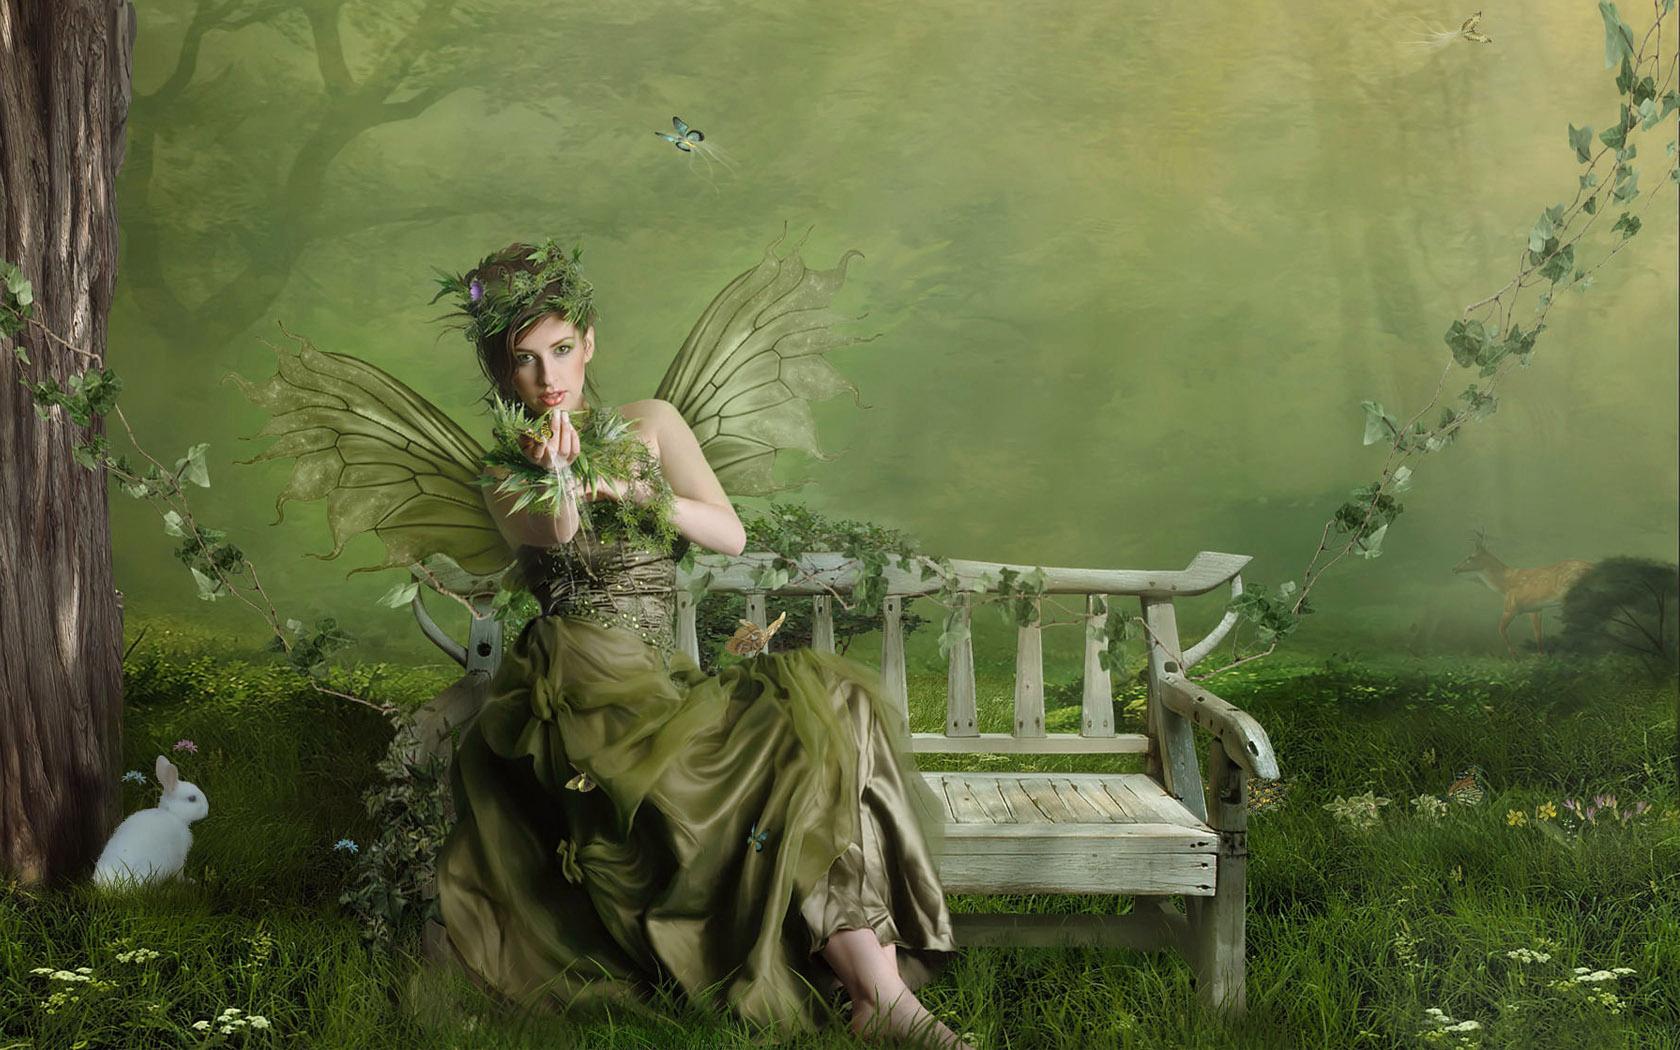 Green Fairy 1680x1050